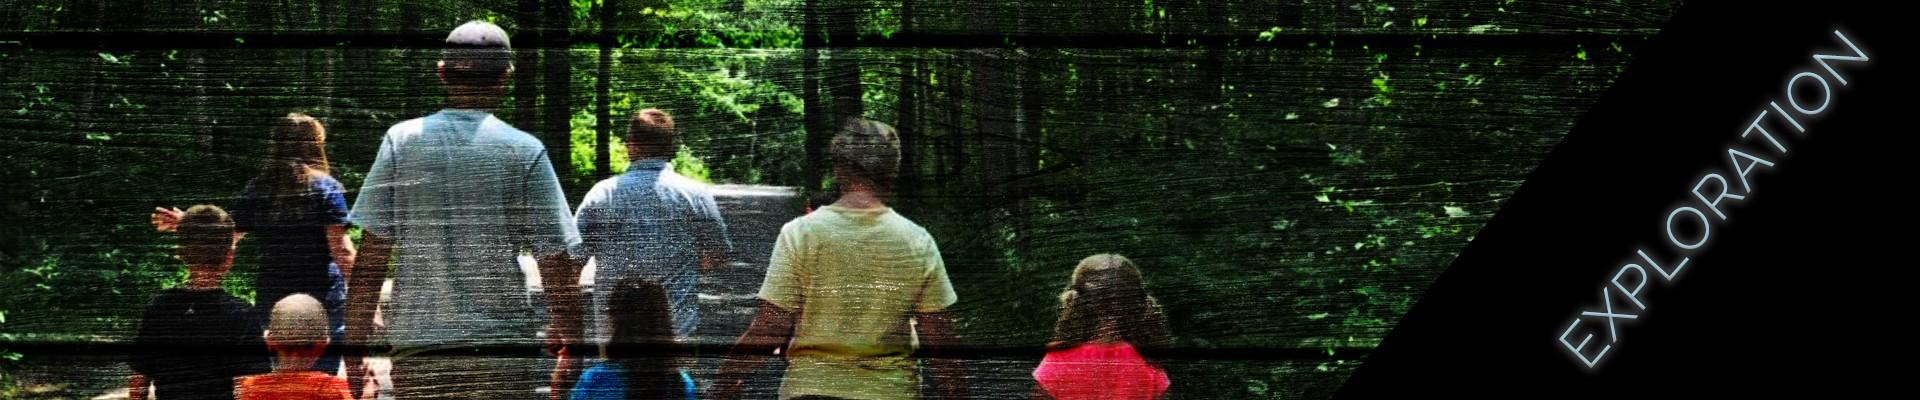 exploration - family walking hiking trail